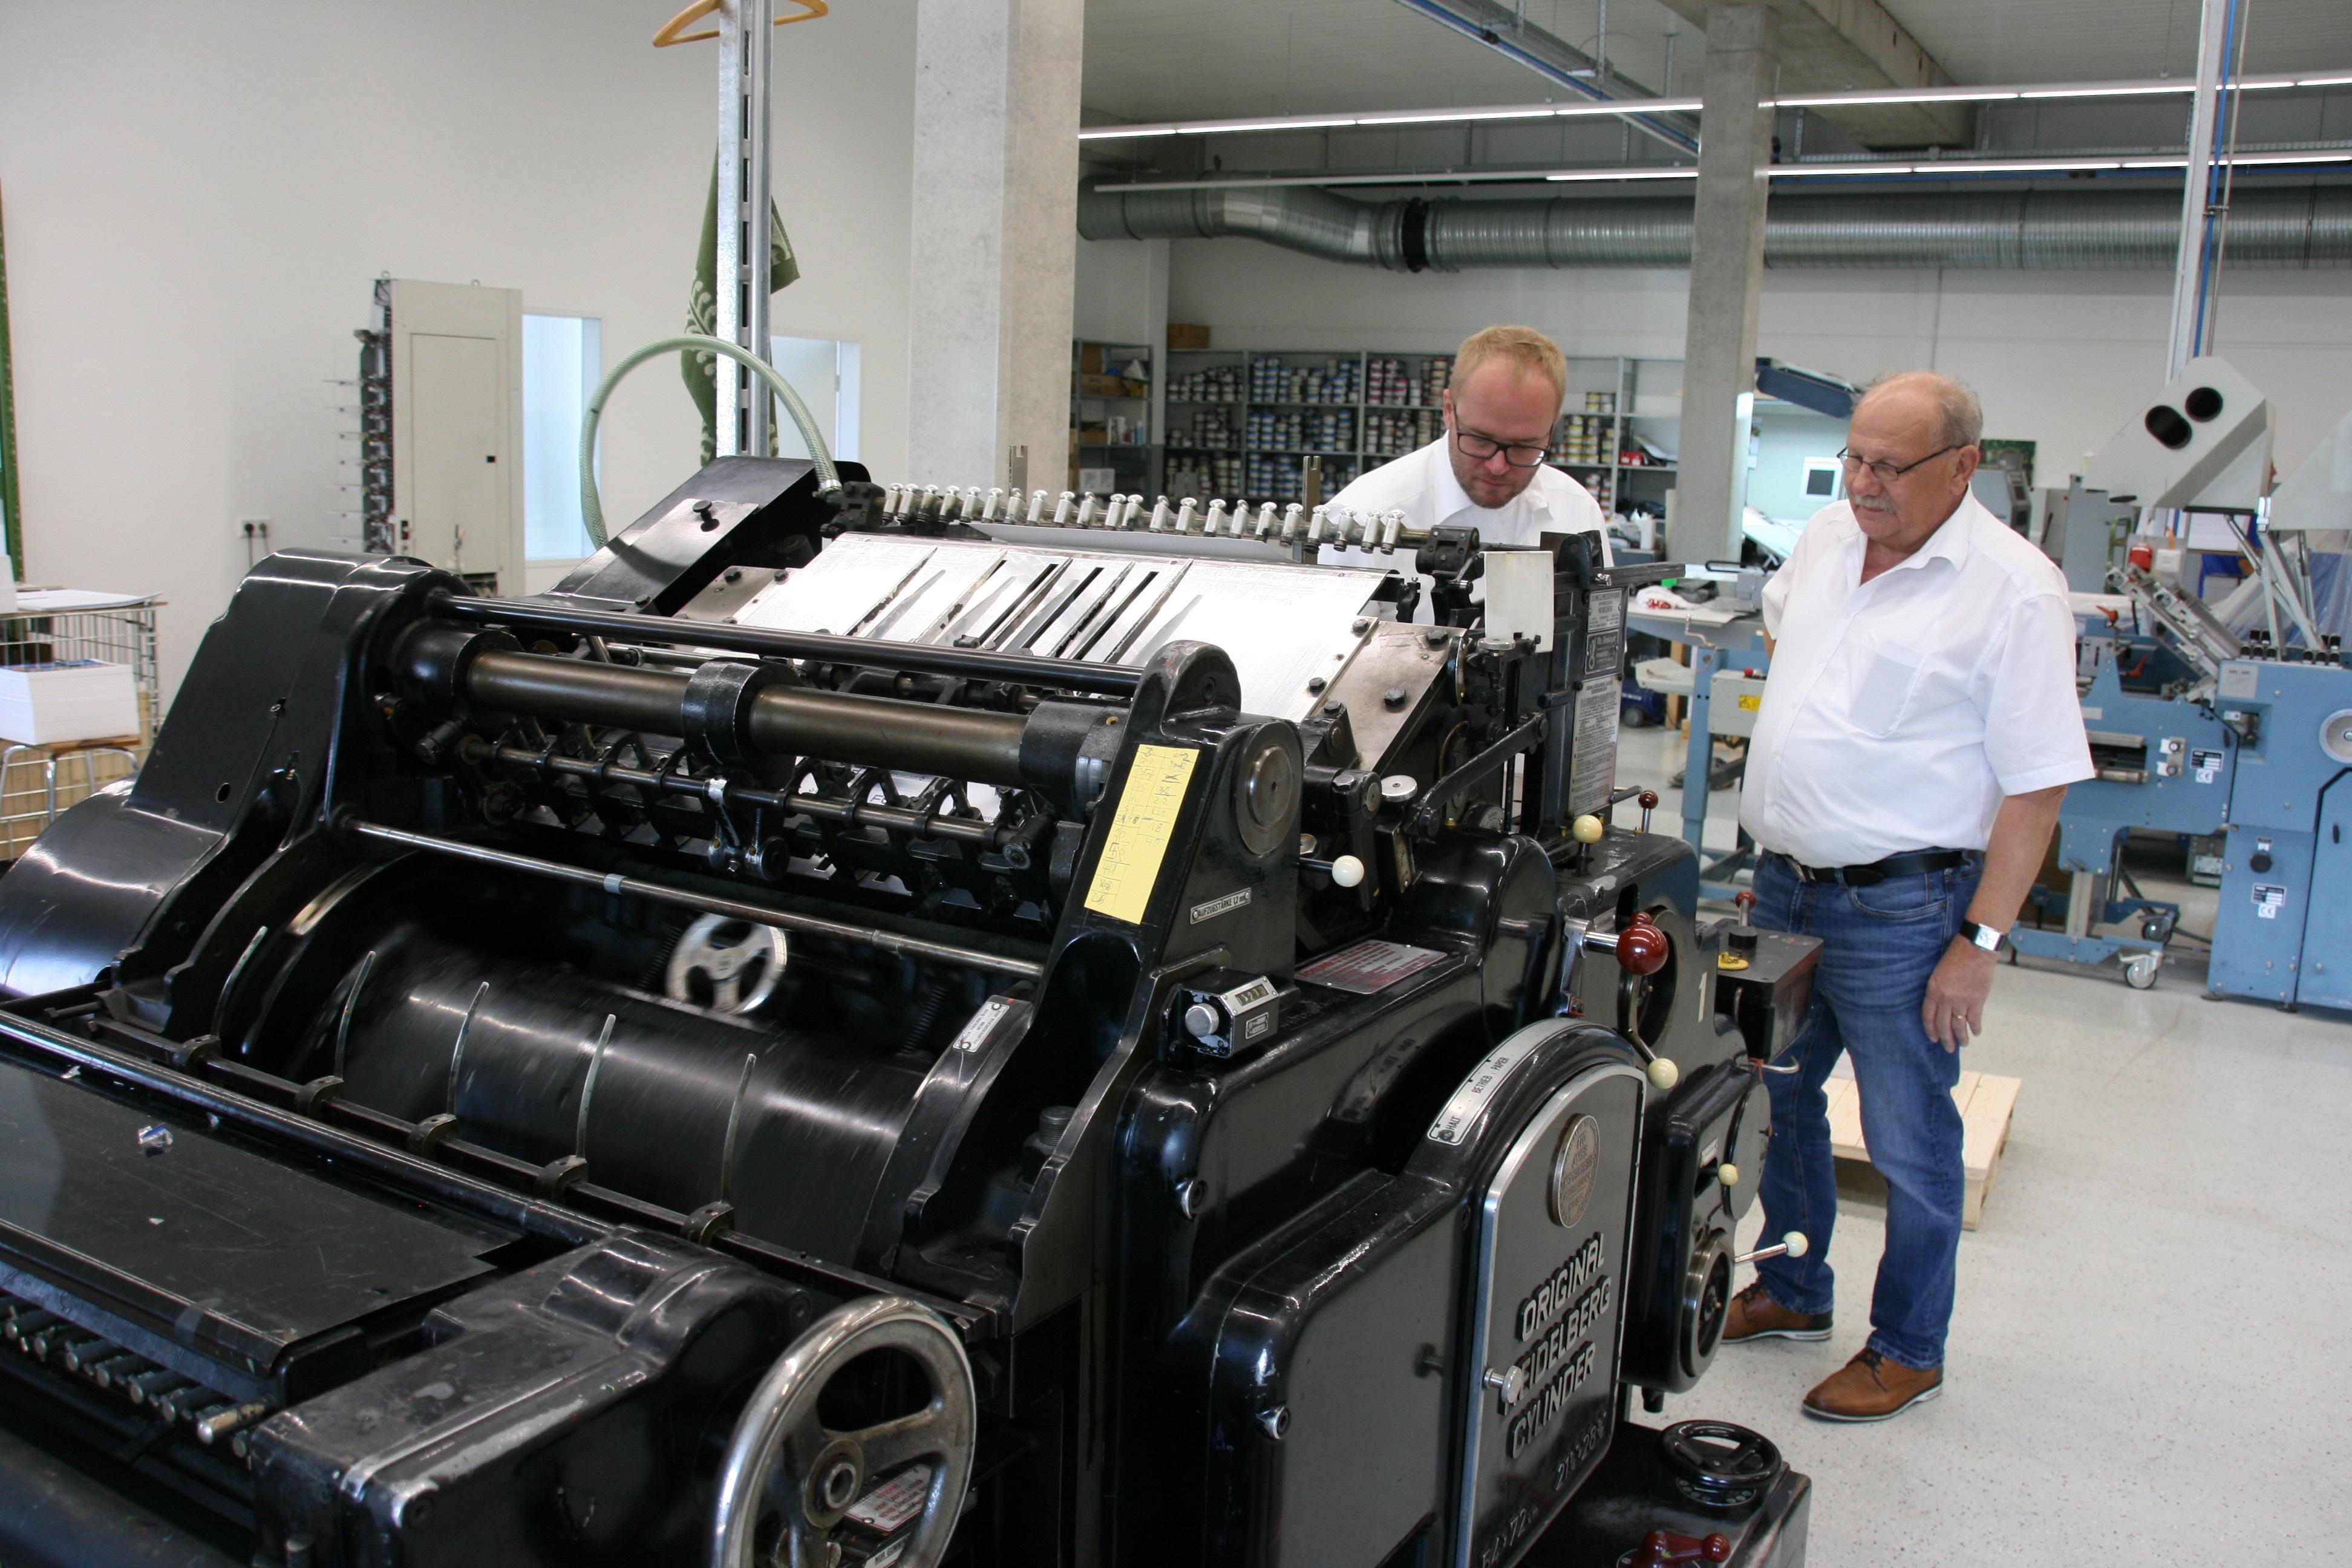 Startseite Druckerei E Sauerland Gmbh